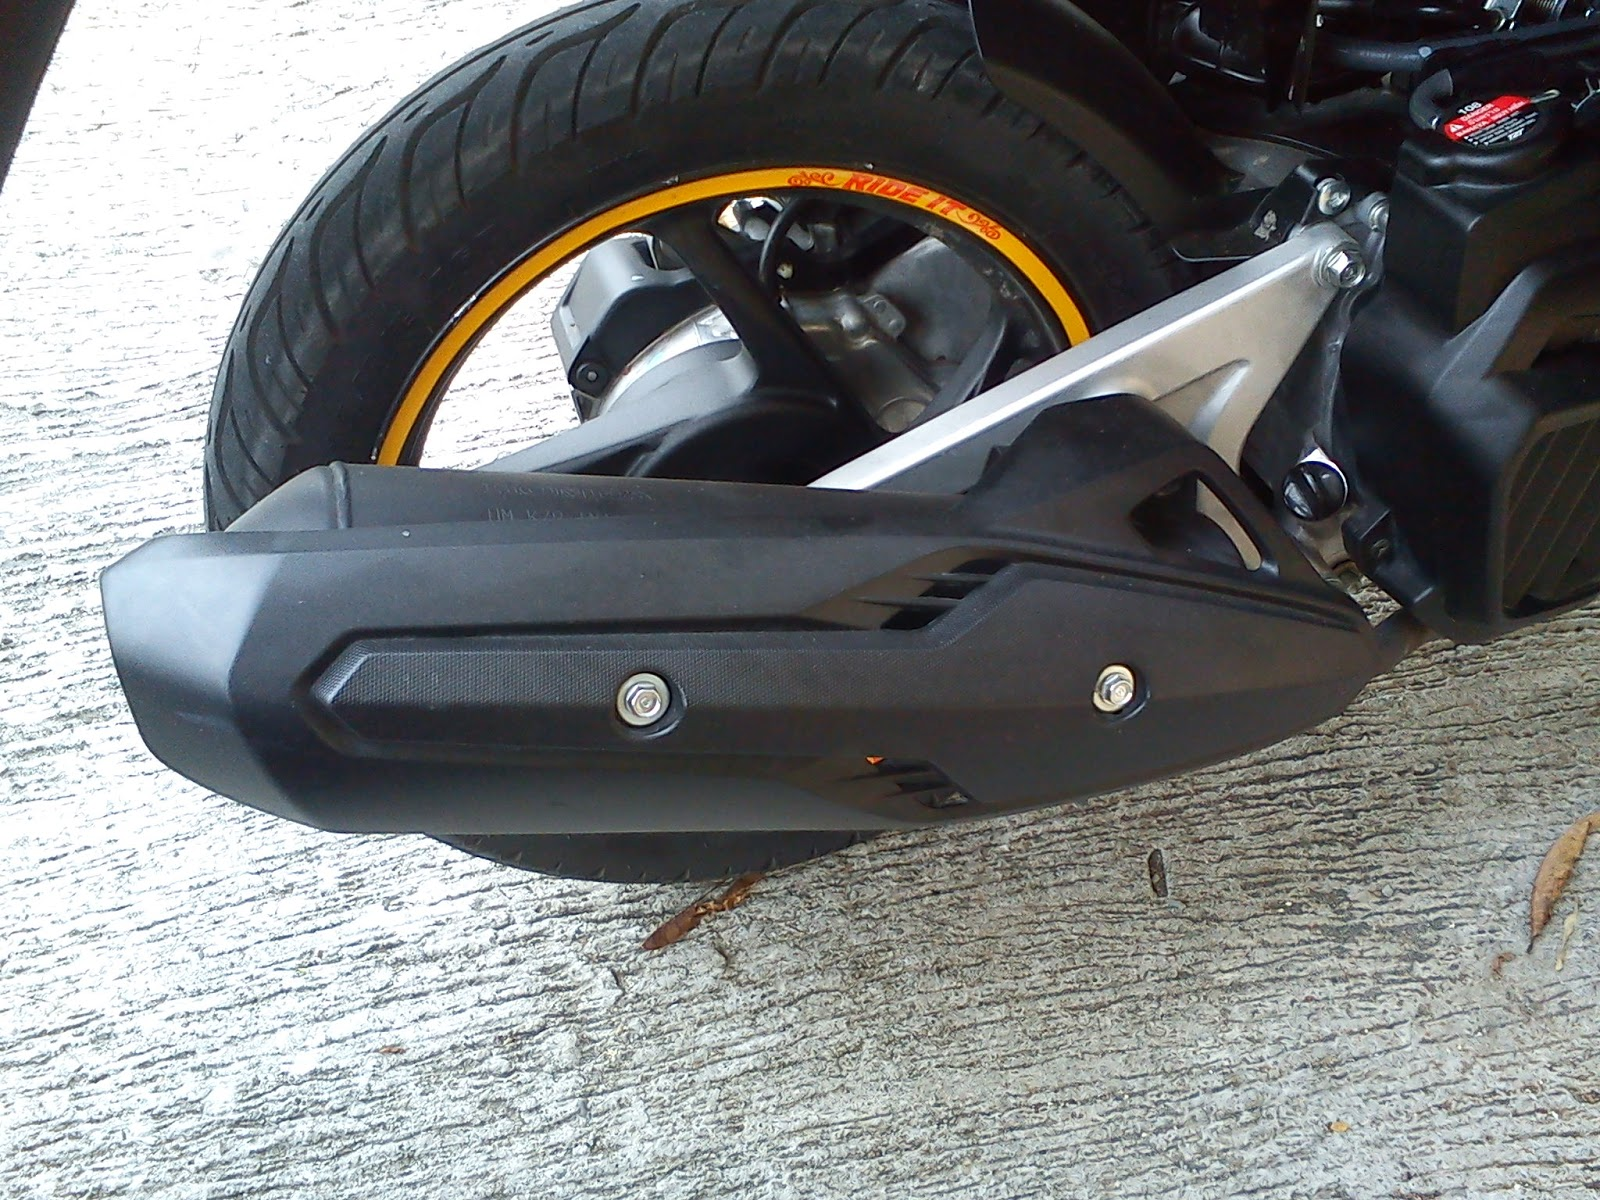 Harga Jual Sepeda Motor Vario 125 Honda Modif New Esp Cbs Iss Bionic Red Solo Ukuran Ban Really Cheap Tires